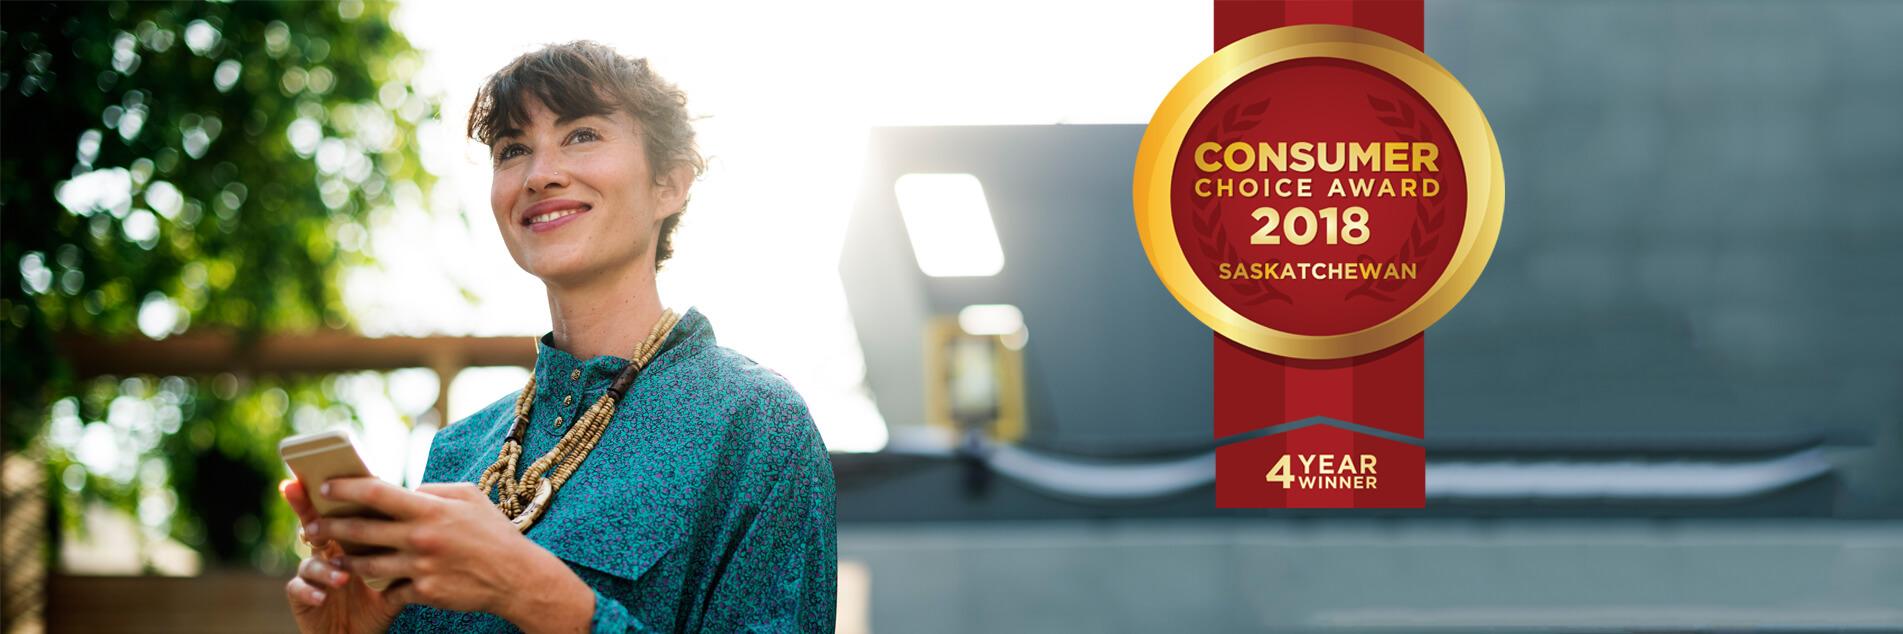 Consumer Choice Award 2018 - 4 Year Winner!